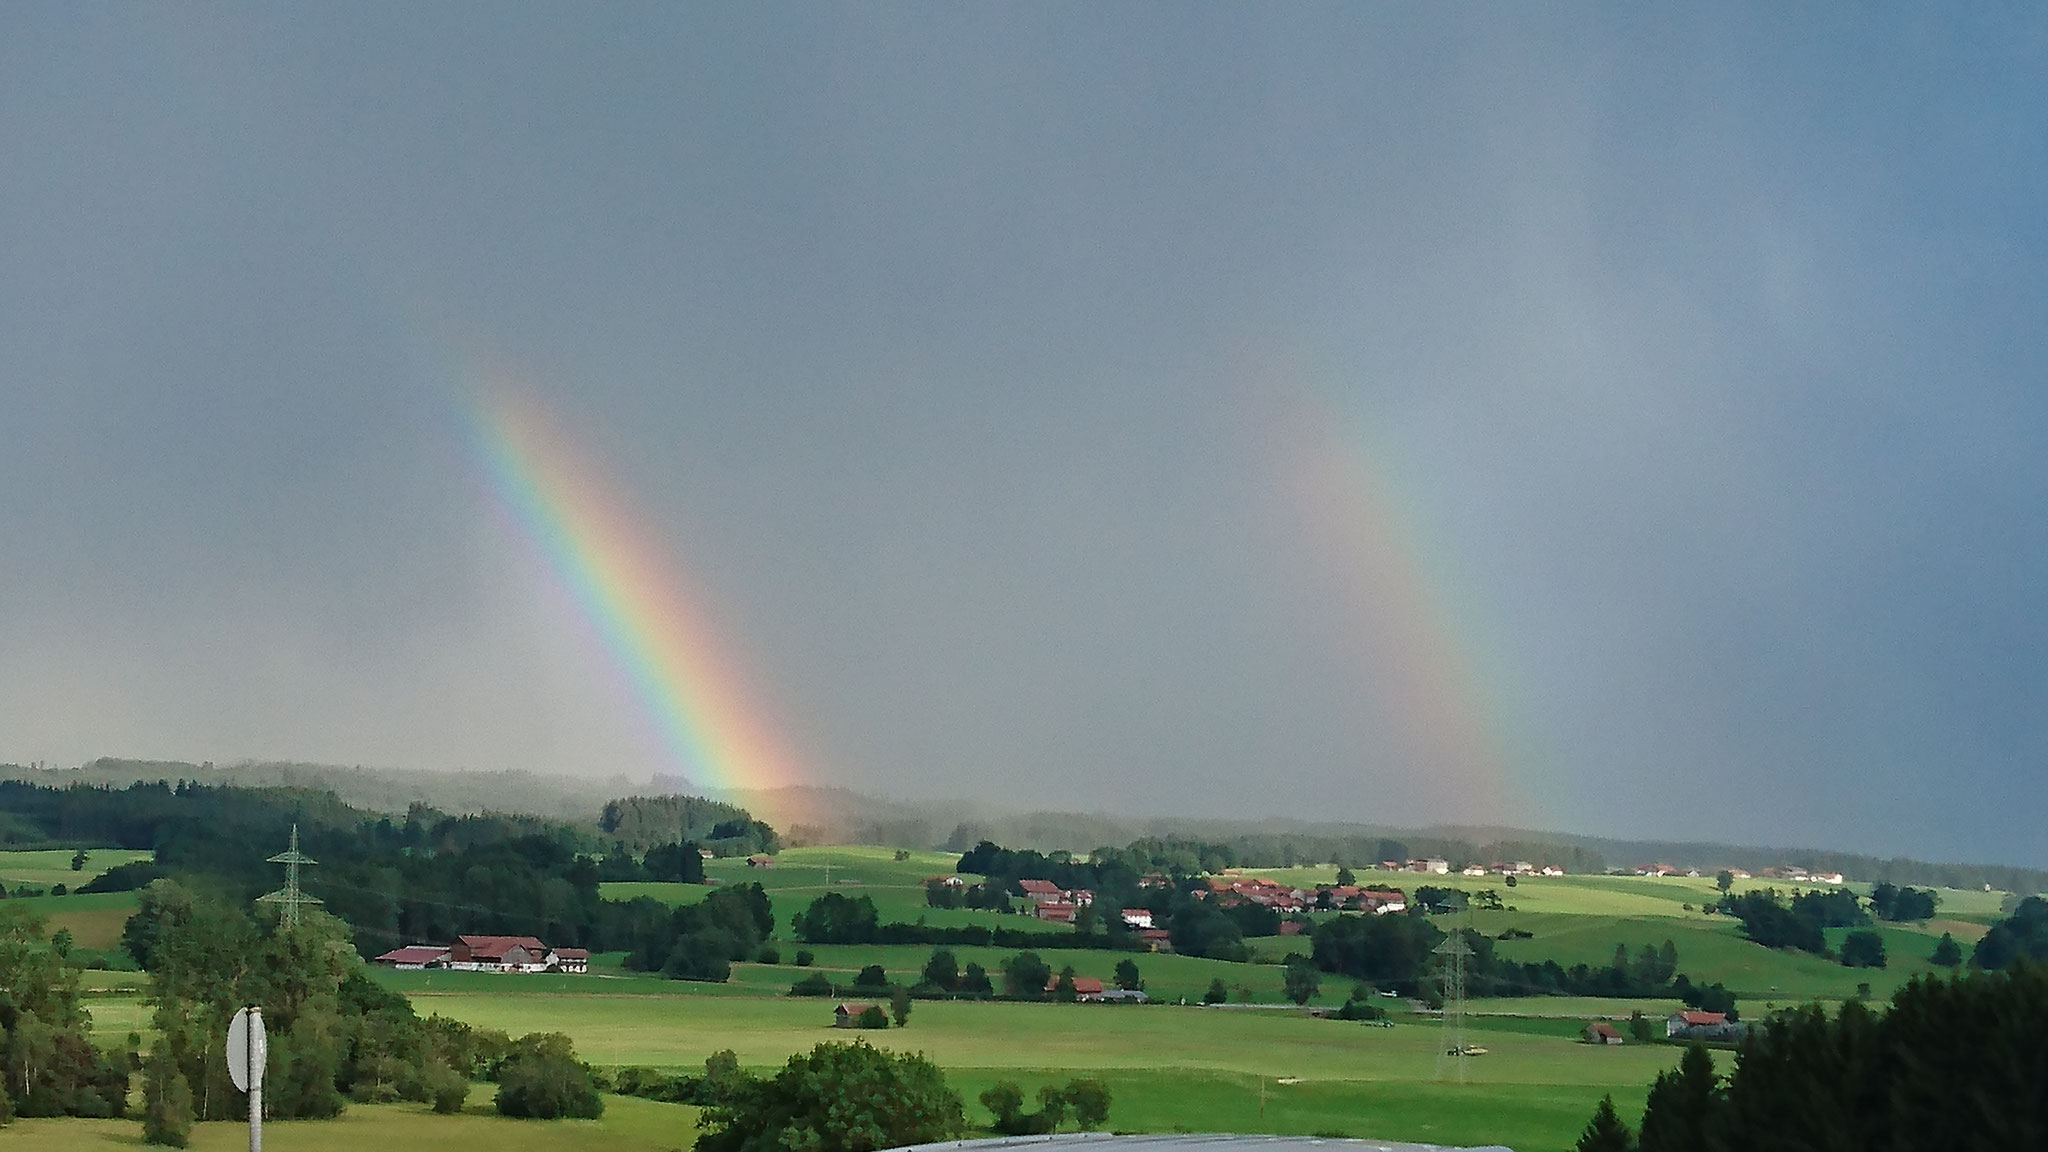 Regenbogen-Schauspiel